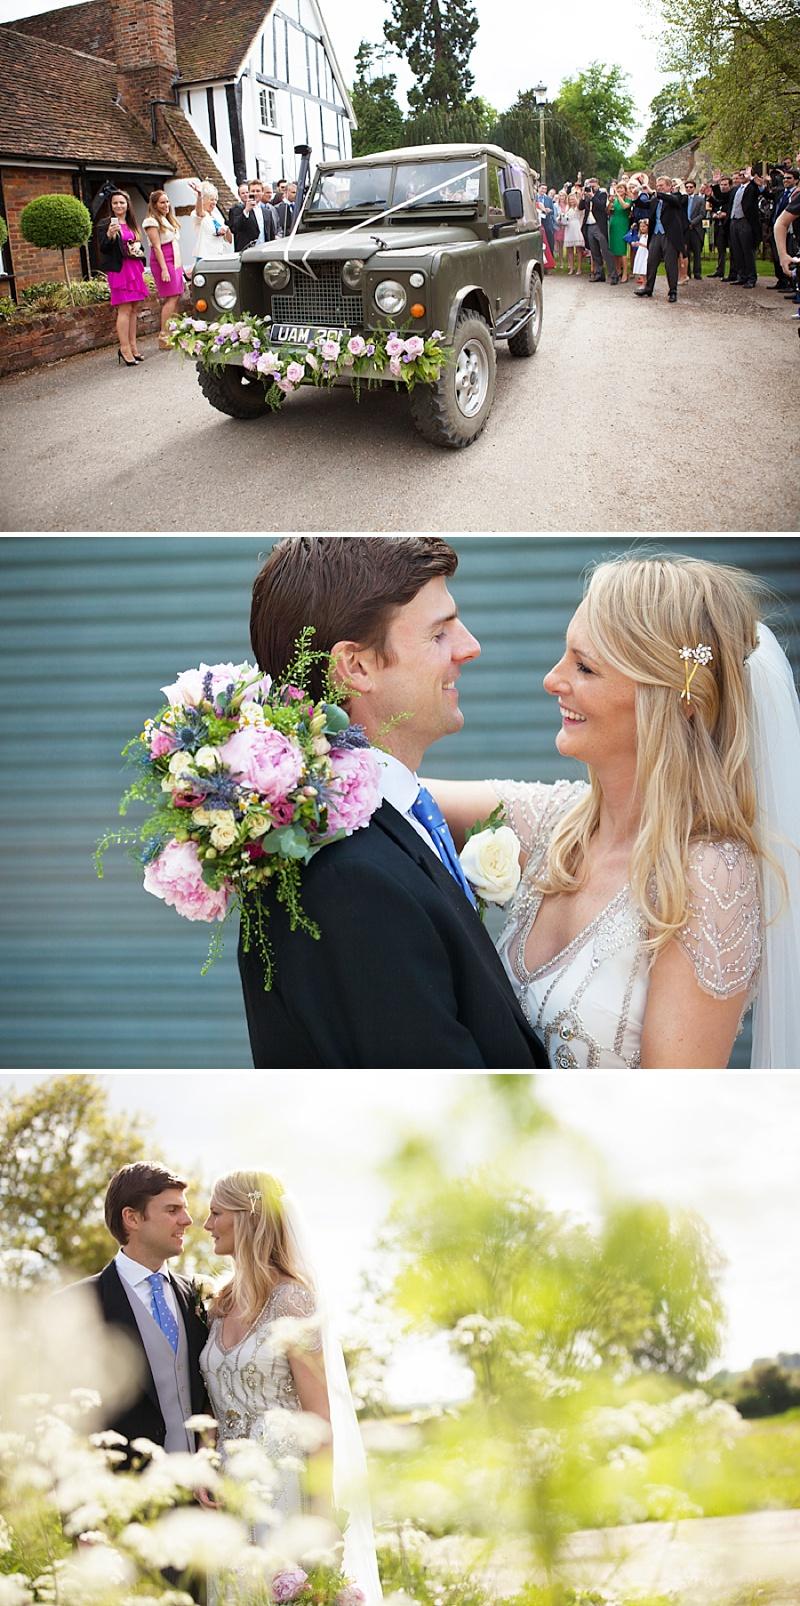 Summer Garden Party Wedding In Hertfordshire, Bride In Jenny Packham Eden Gown, Images by Annamarie Stepney_0010